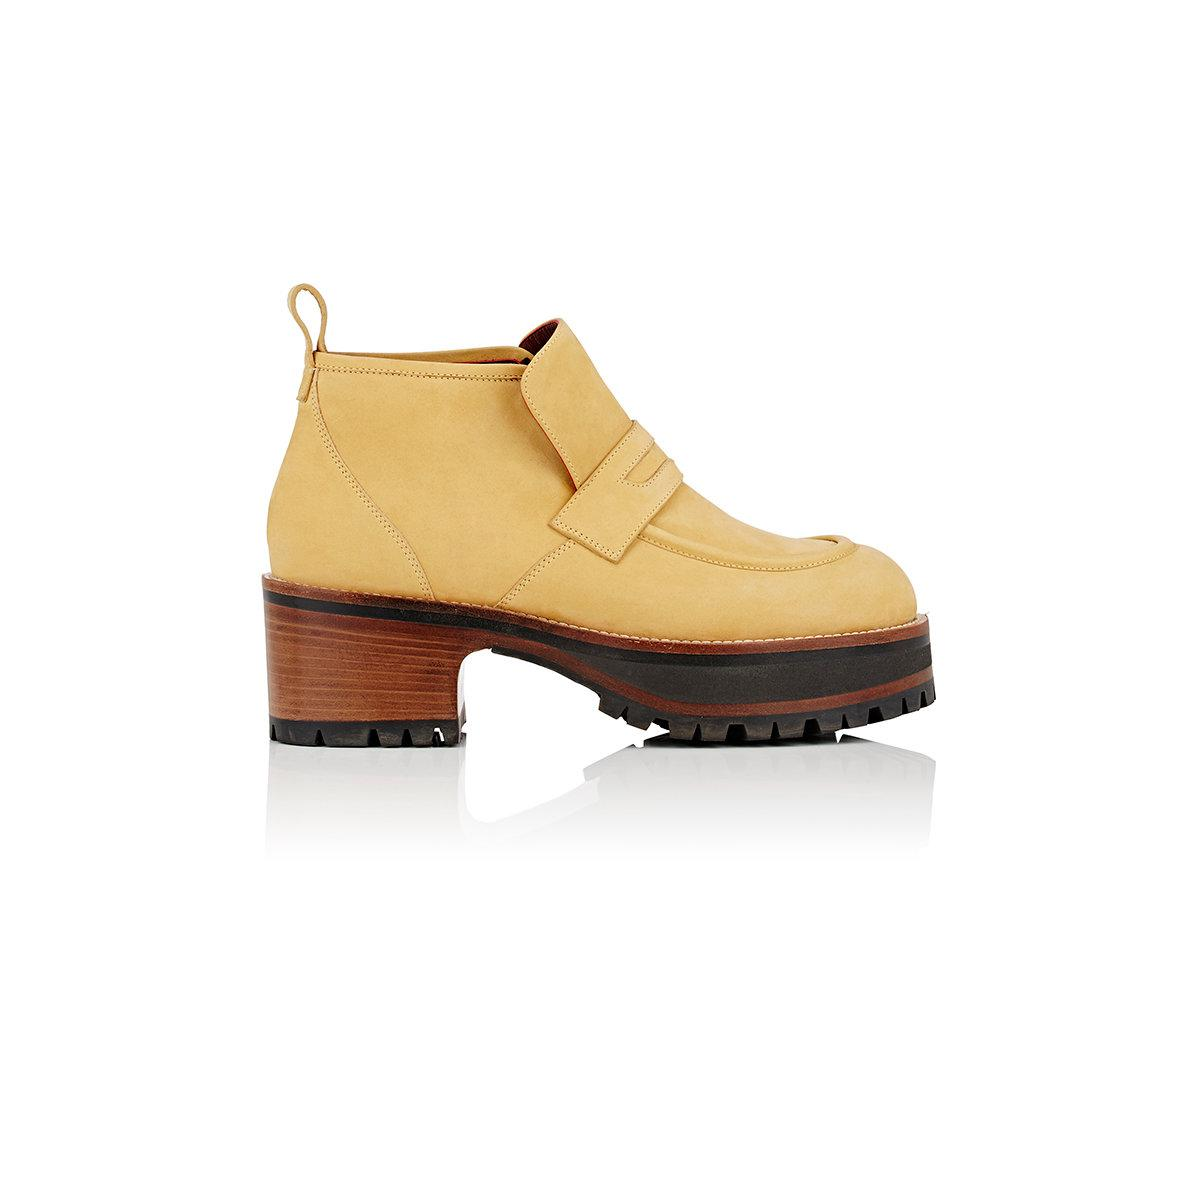 Sies marjan Jane suede platform ankle boots SCsc5Ms